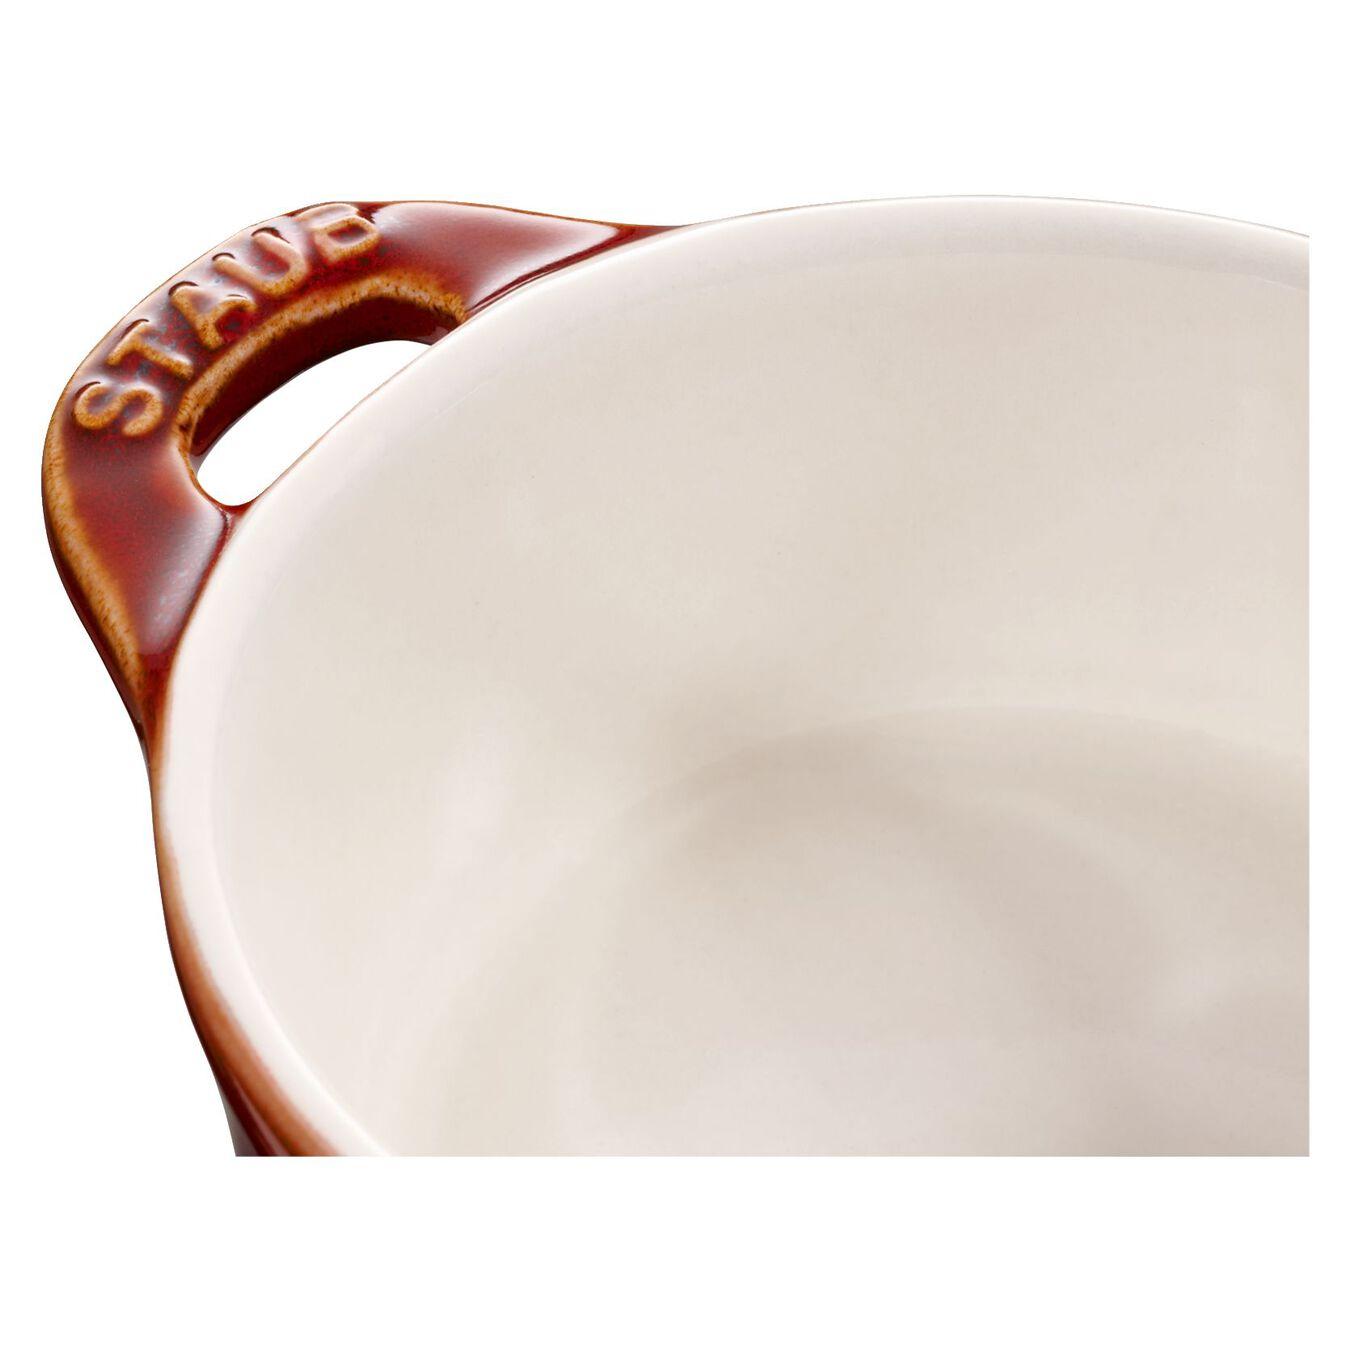 Minigryta 10 cm, Rund, Antik koppar, Ceramic,,large 2